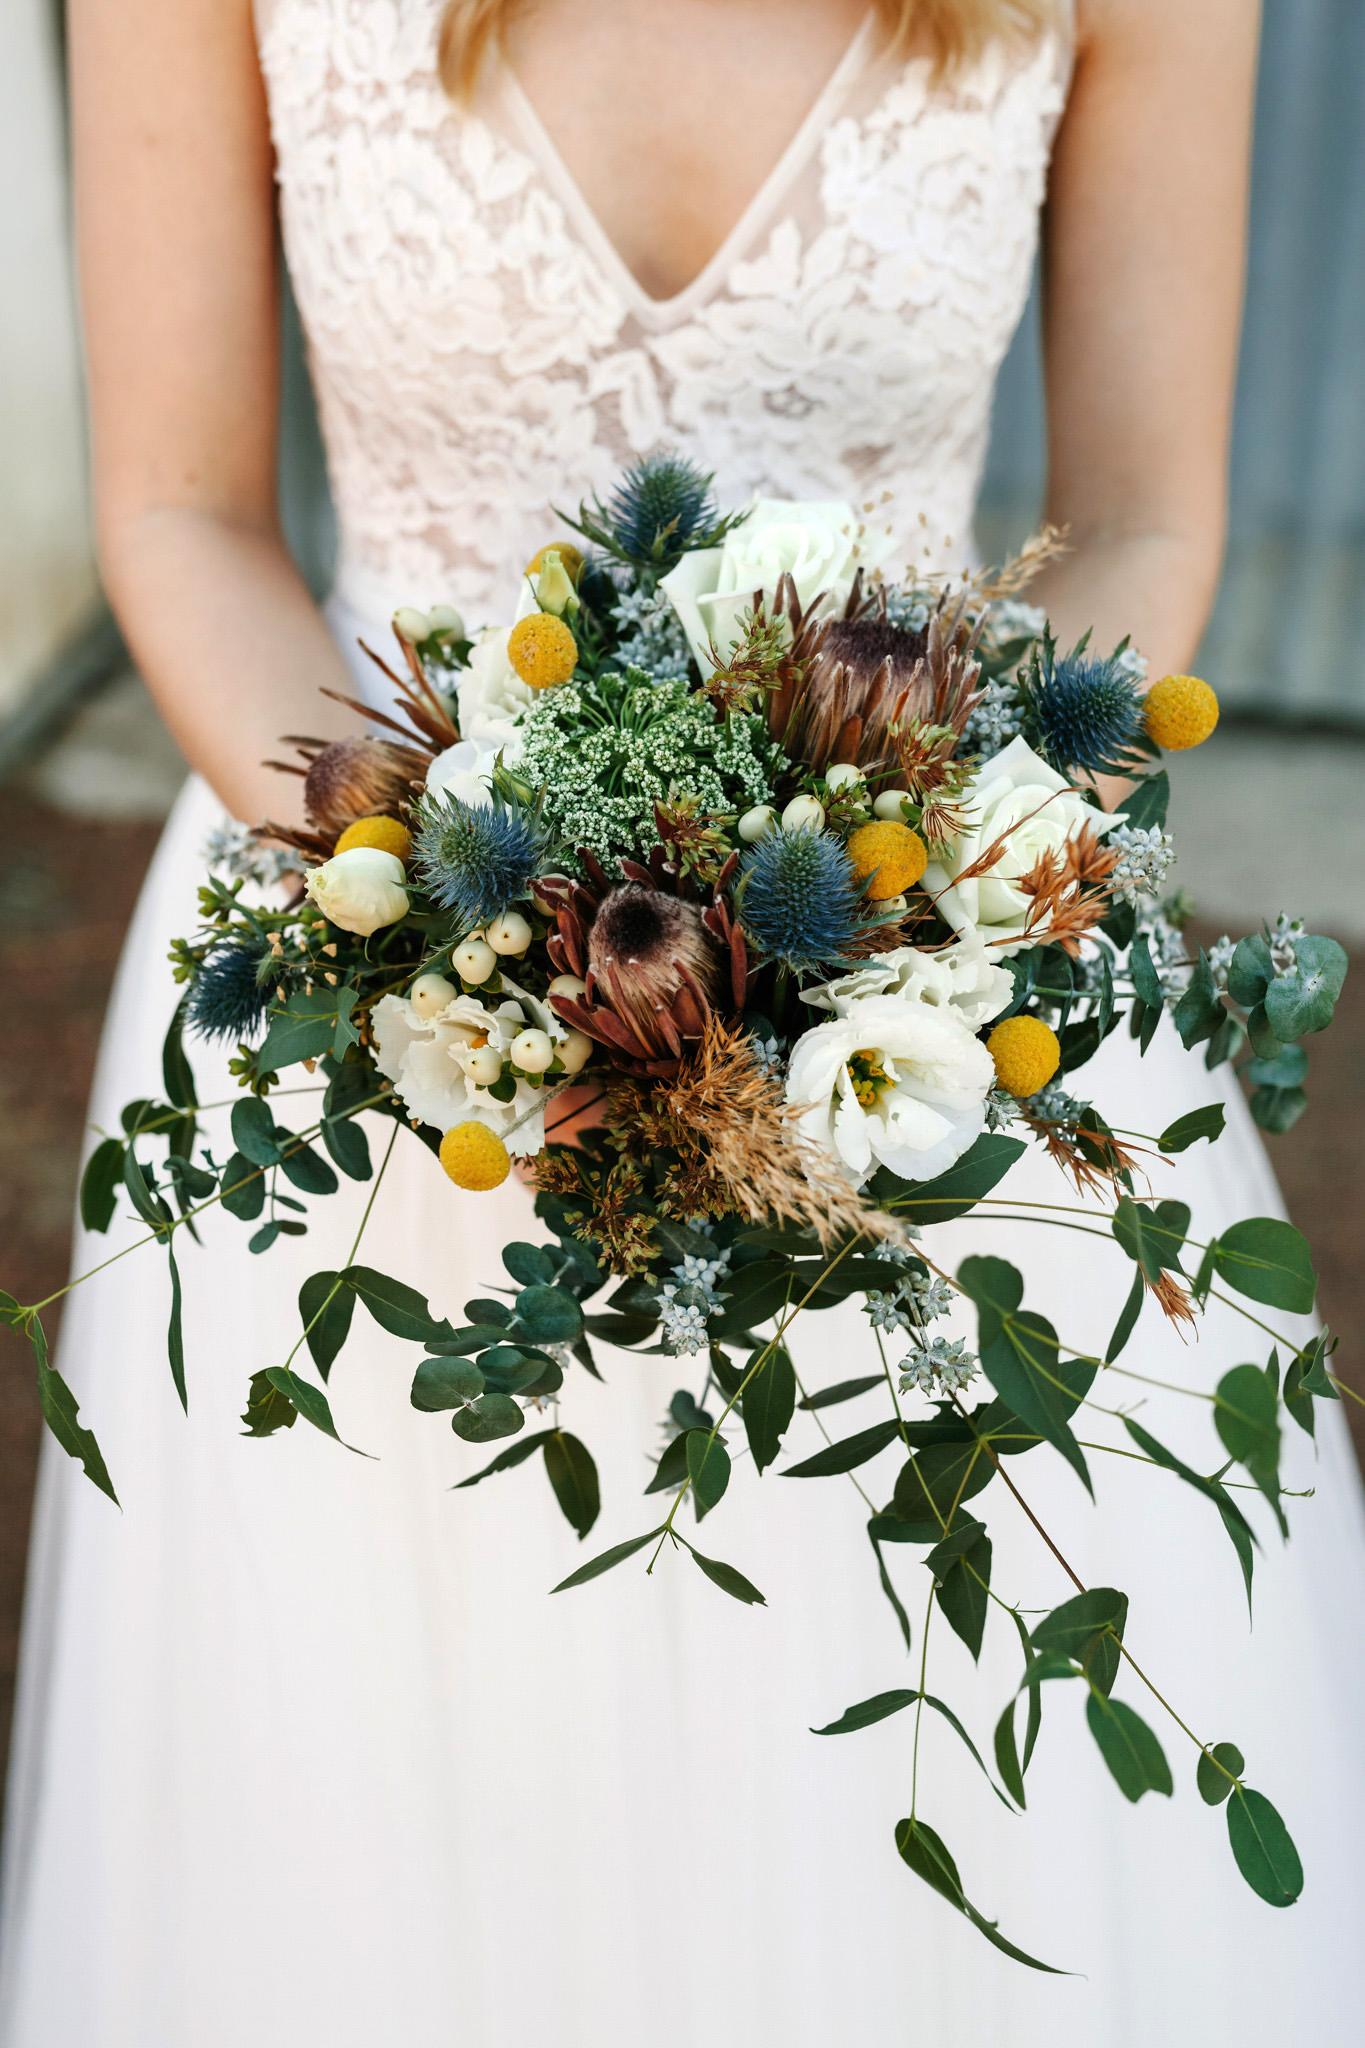 Erin_Latimore_Mudgee_Canberra_Wedding_Photographer_Tuggeranong_Homestead_335.JPG